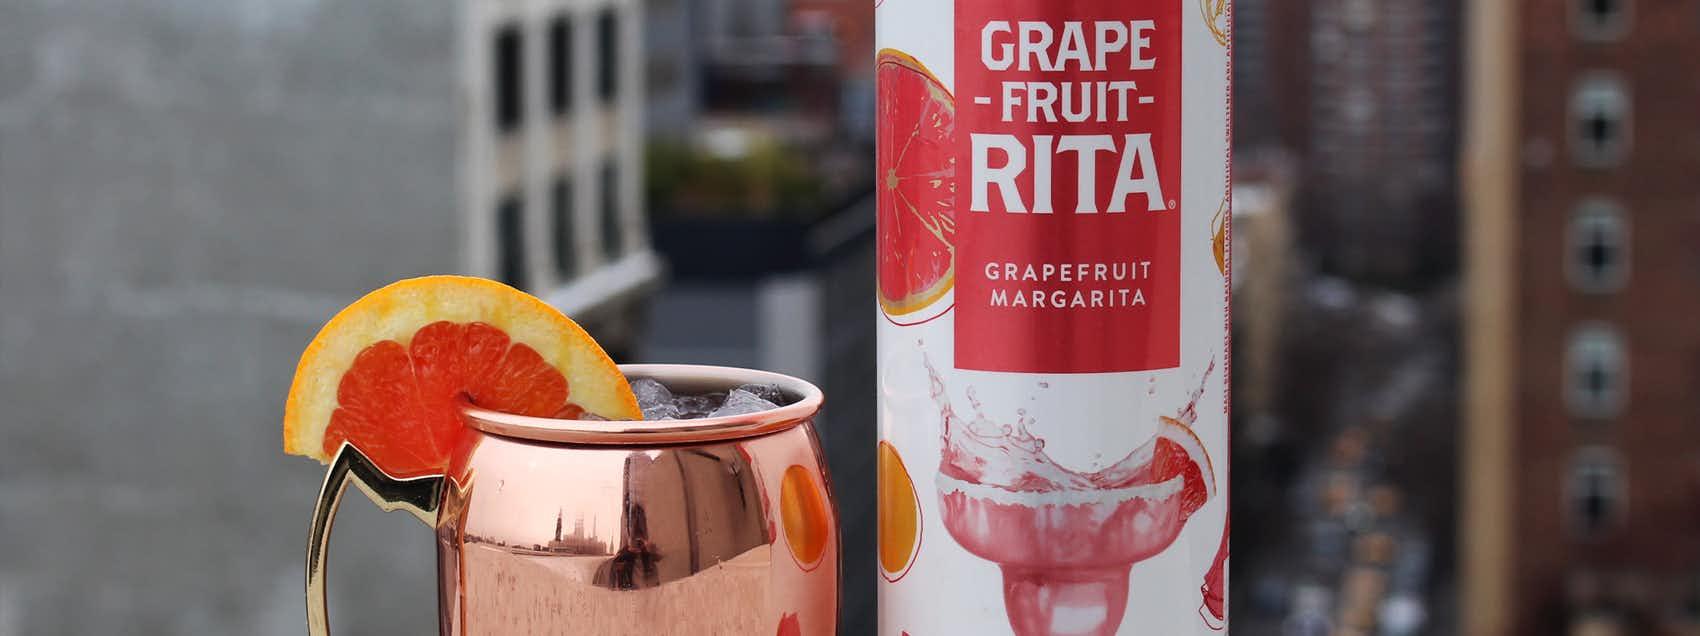 Grape-Fruit-Mule